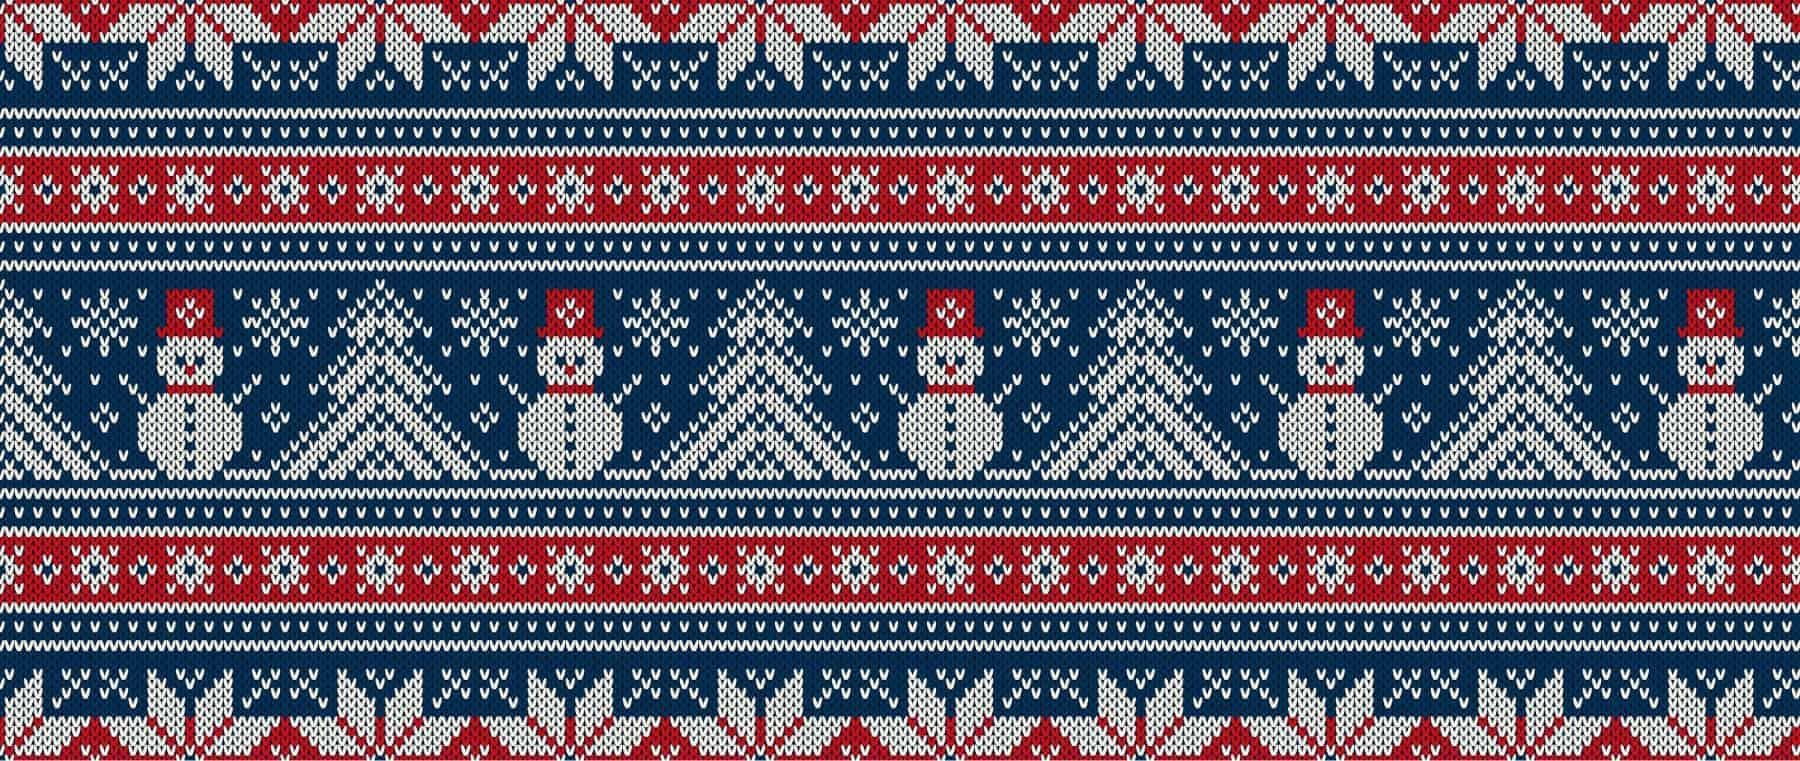 Christmas Jumper Day 2018 - National Awareness Days Events Calendar 2018 & 2019 - UK & US